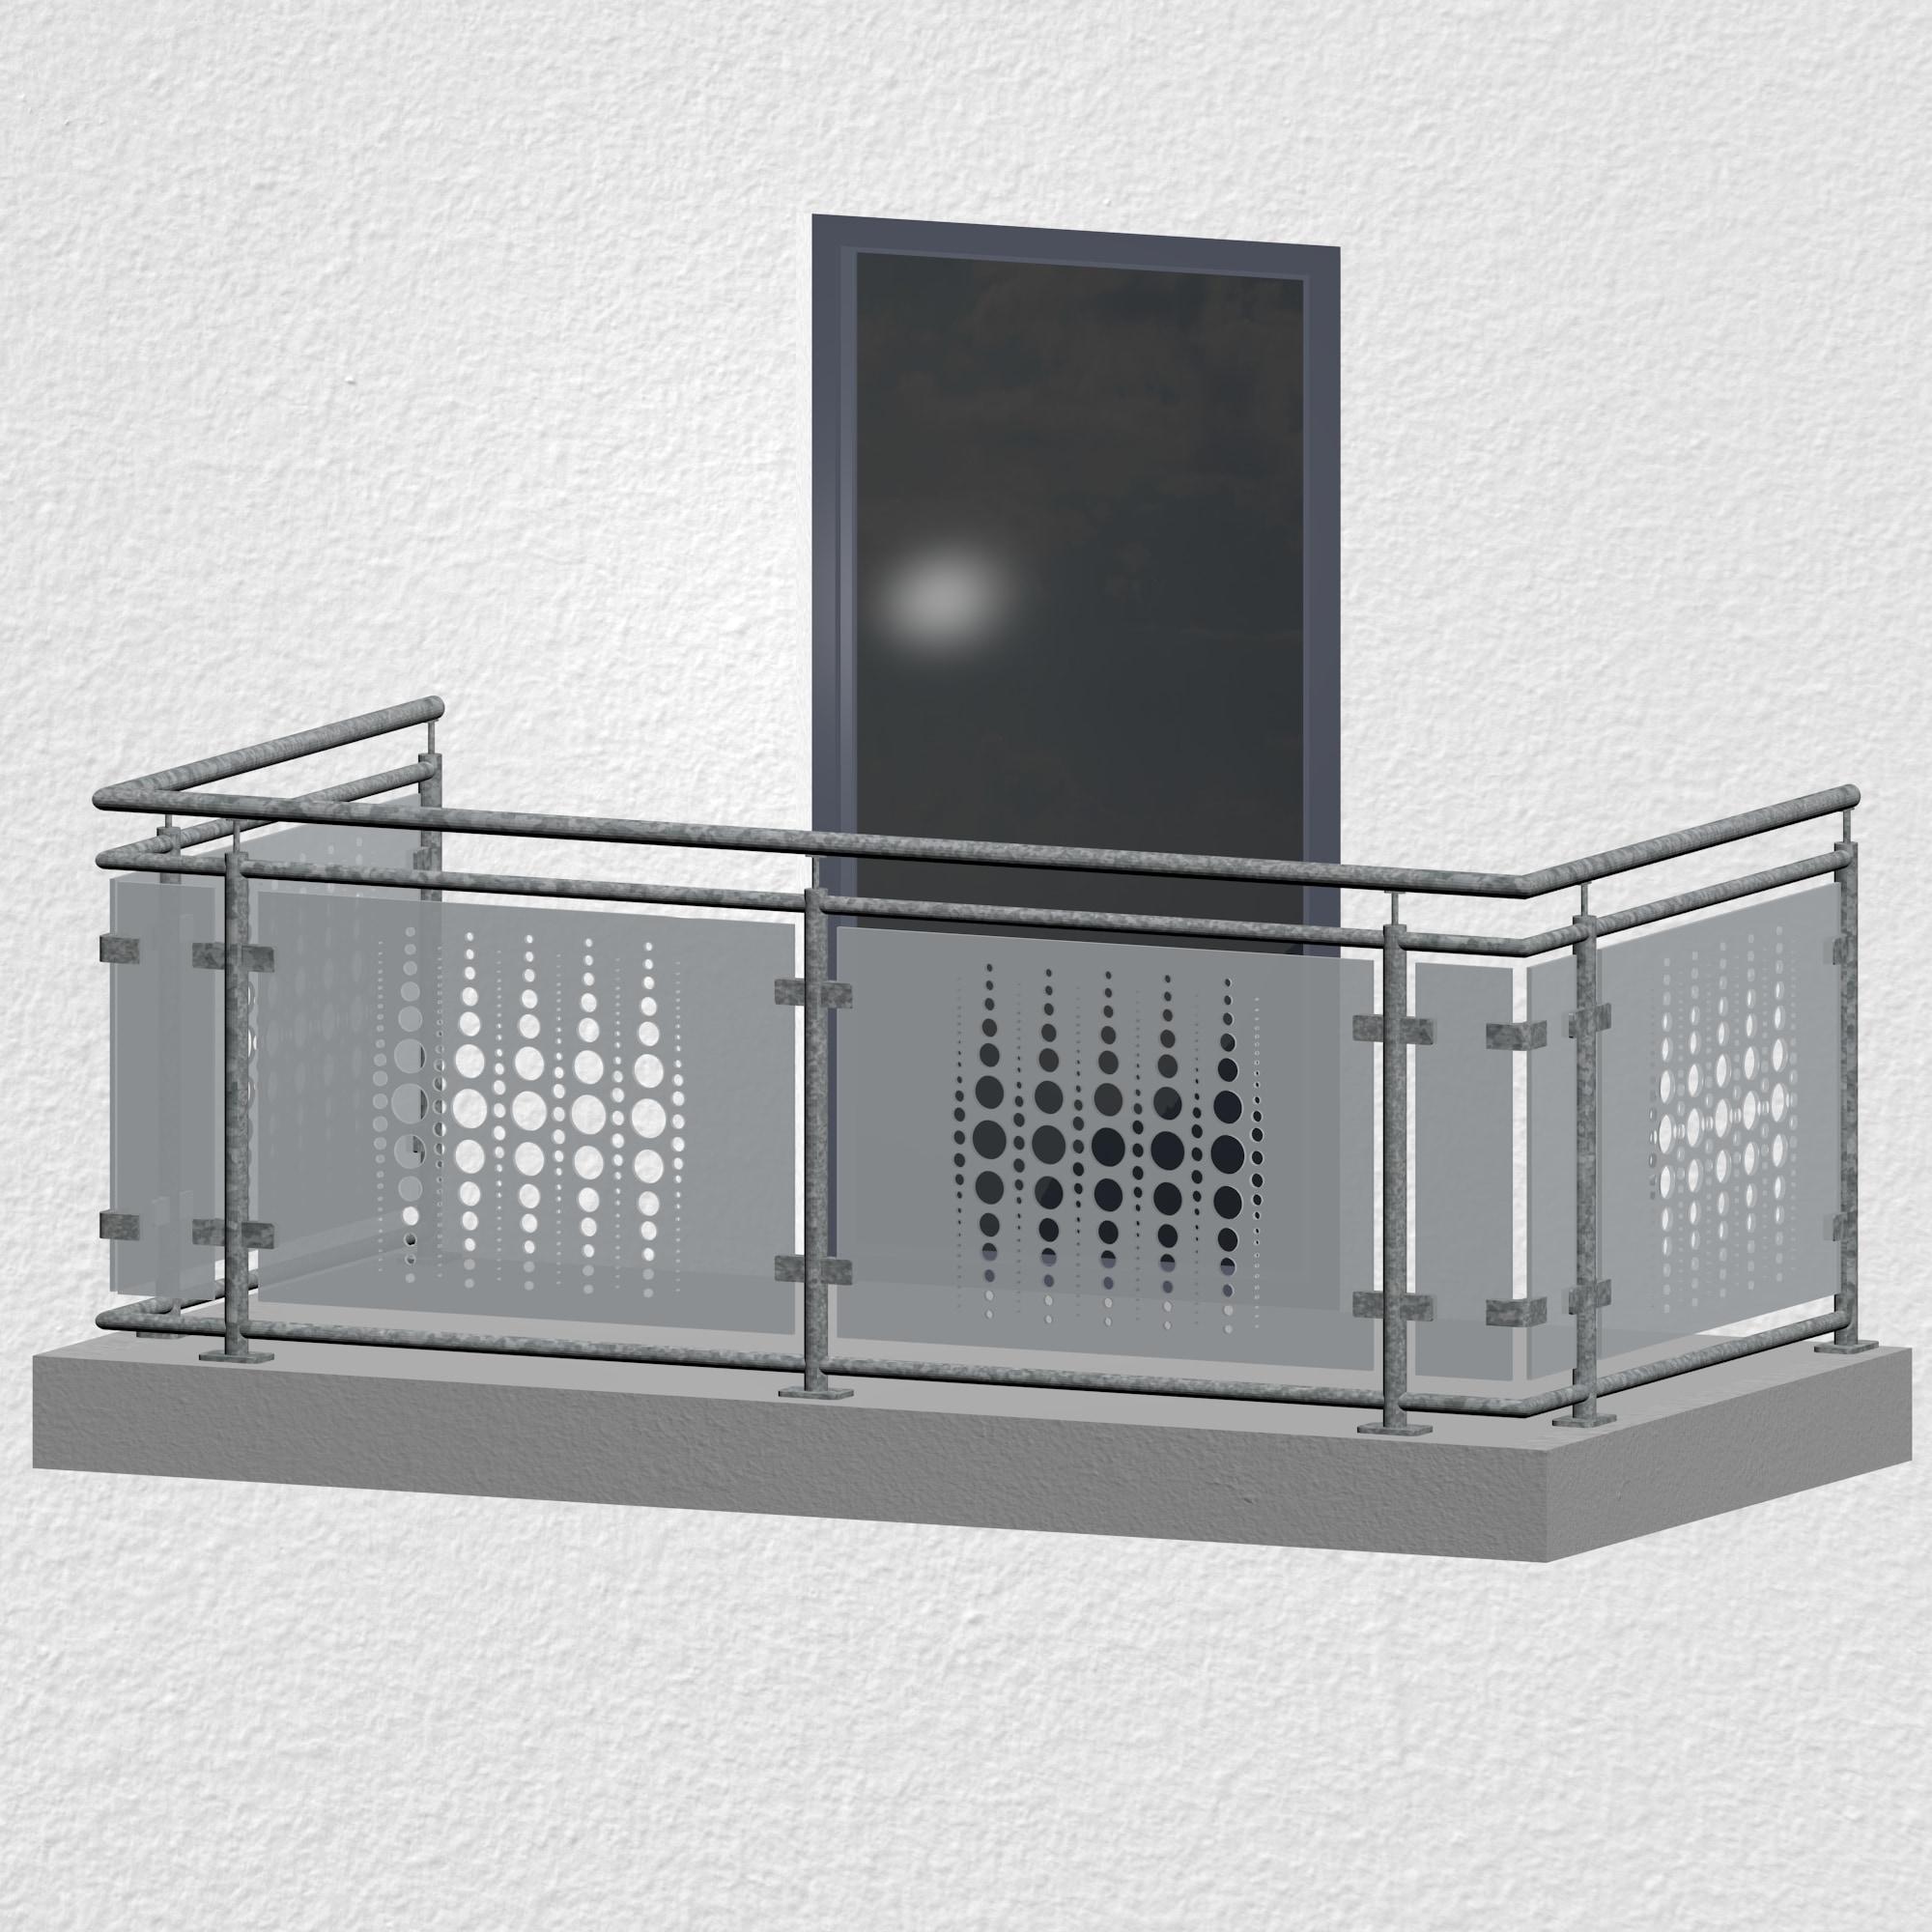 Balkongeländer verzinkt Designglas PE